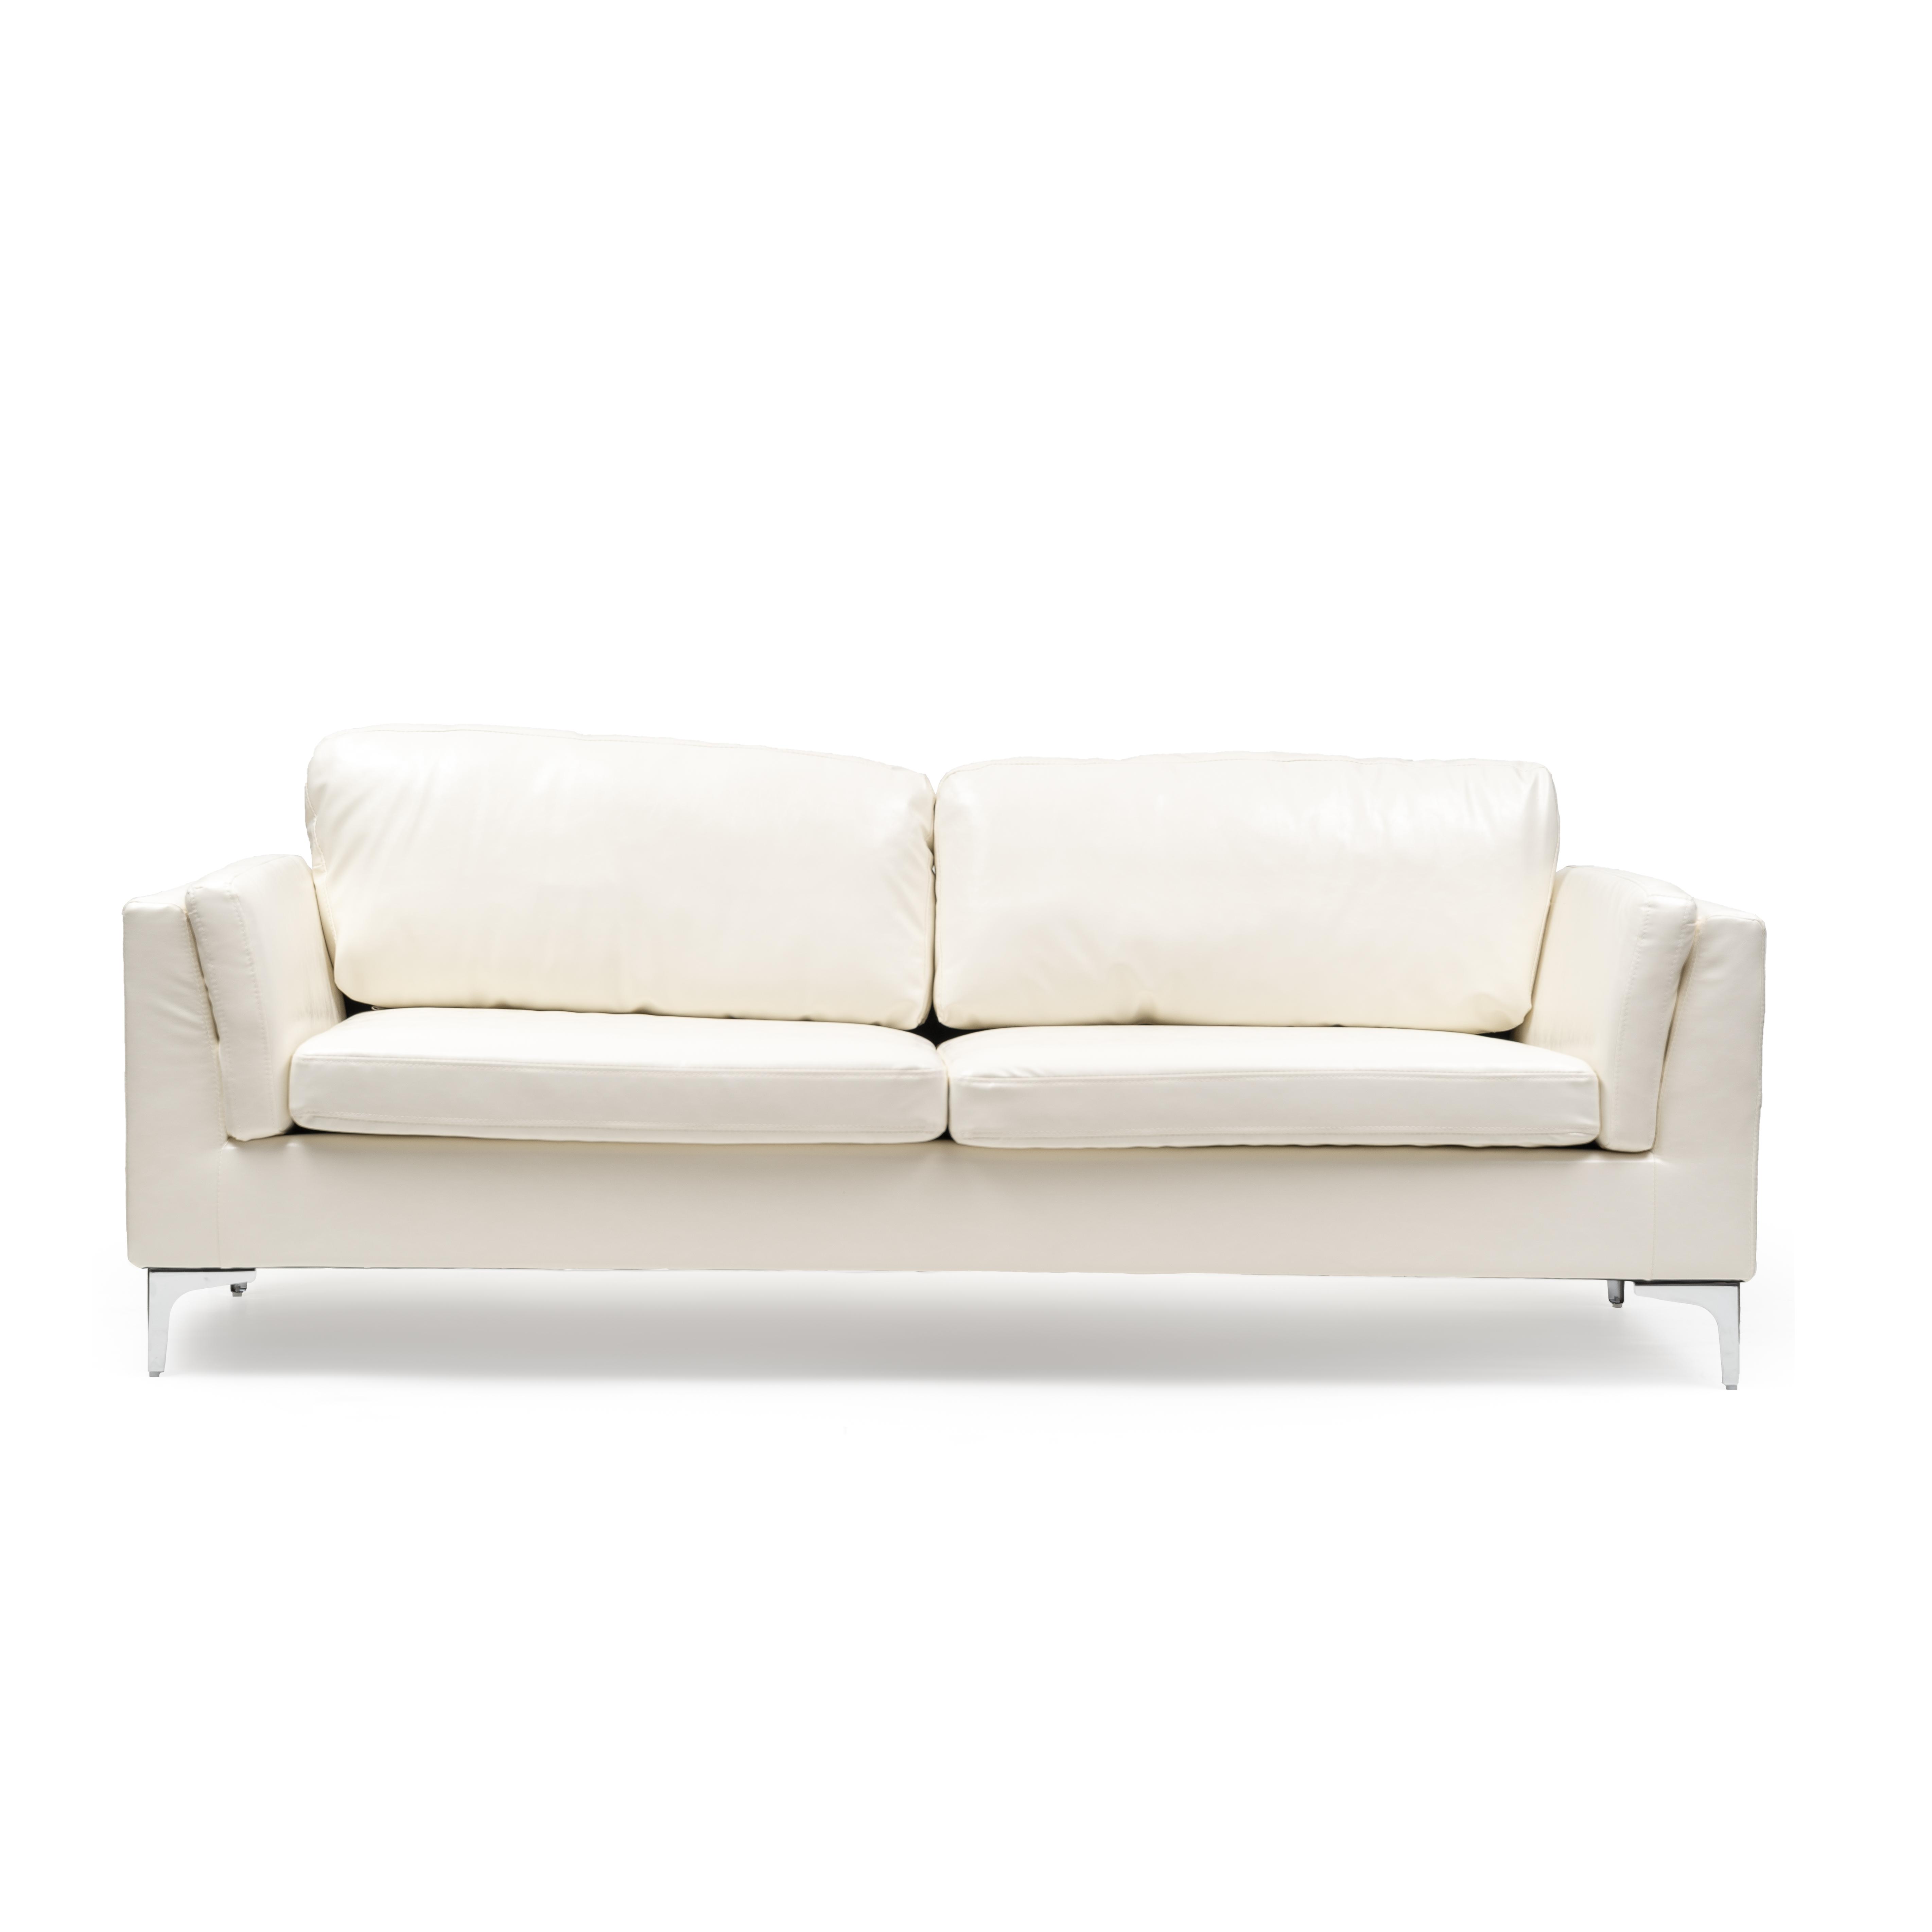 Kelly lounge диван kent белый 137212/3